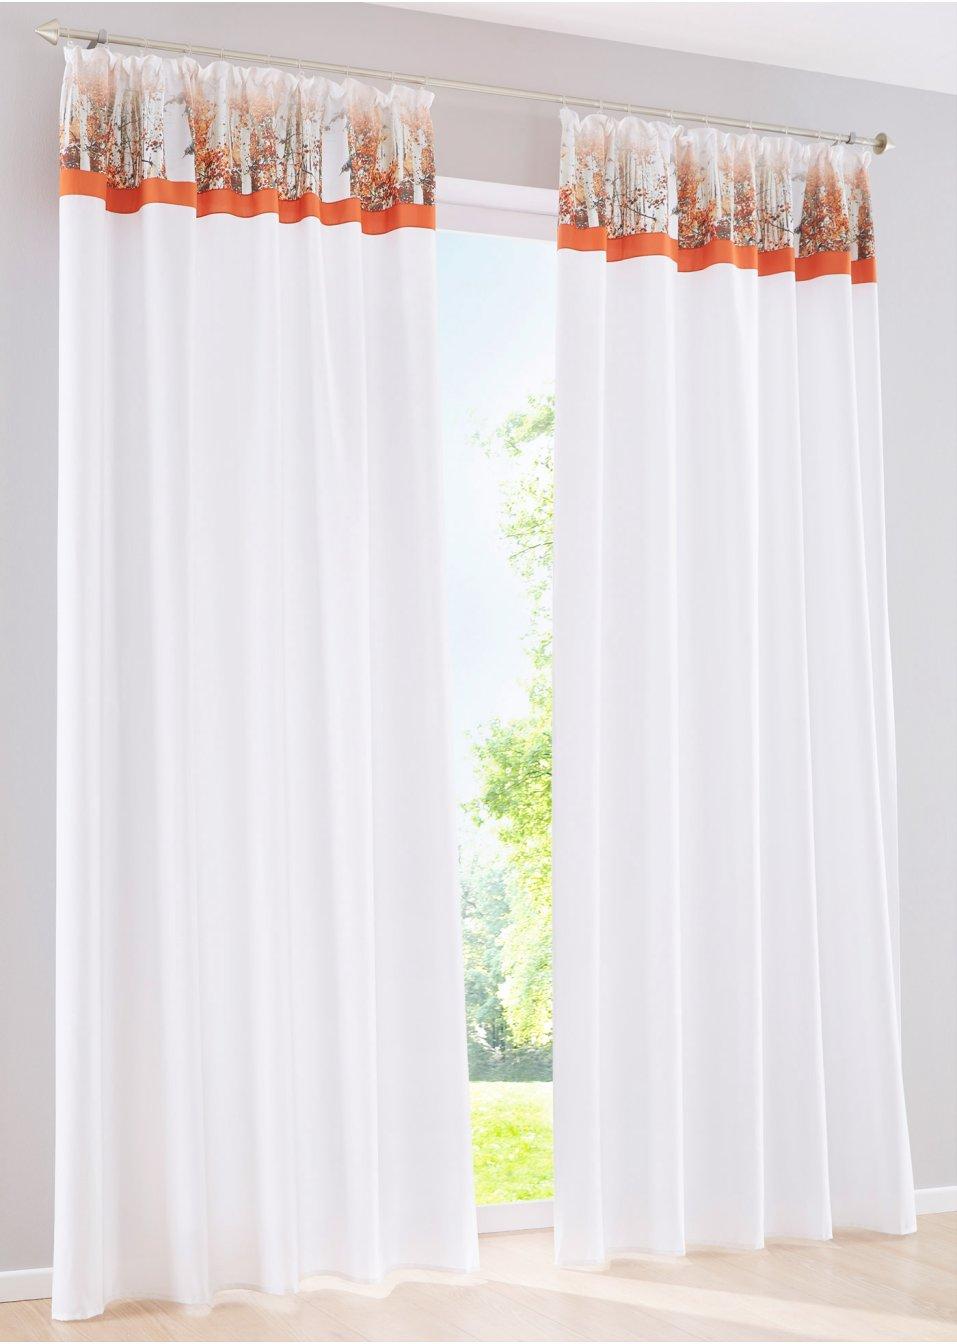 Vorhang clio 1er pack terra bpc living online kaufen - Bonprix vorhang ...